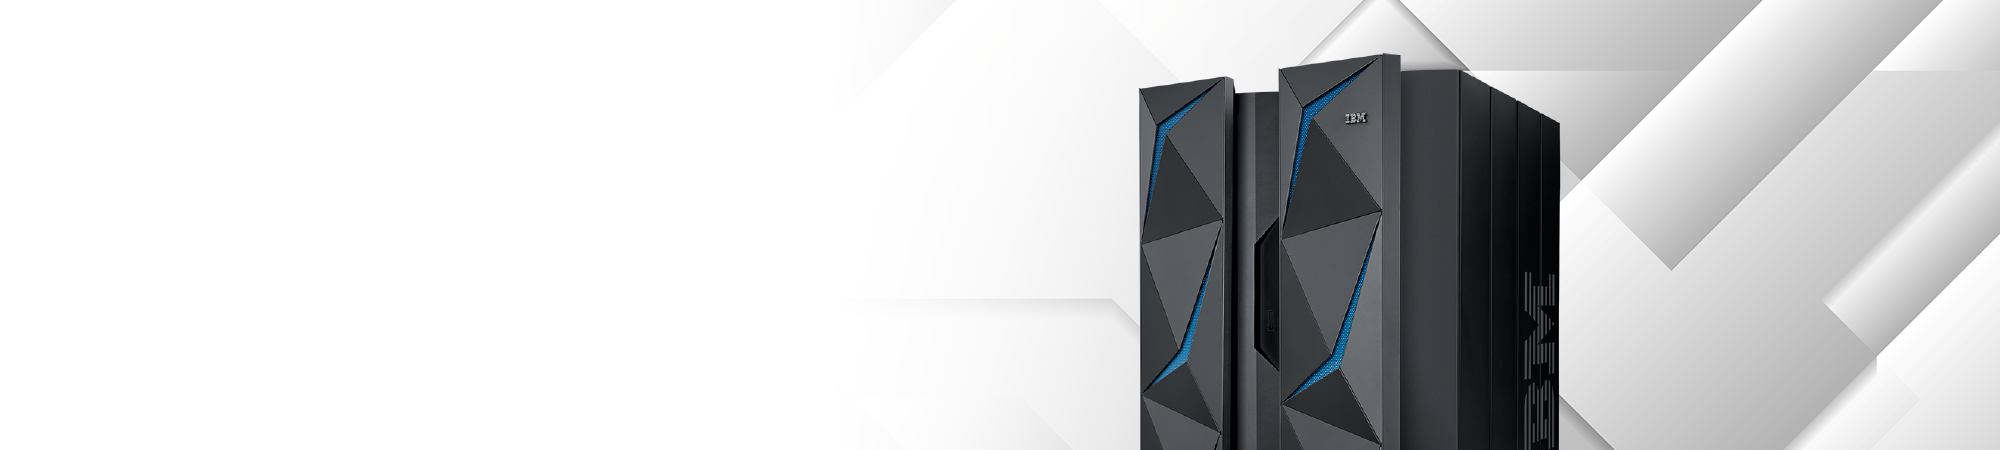 IBM Z mainframes